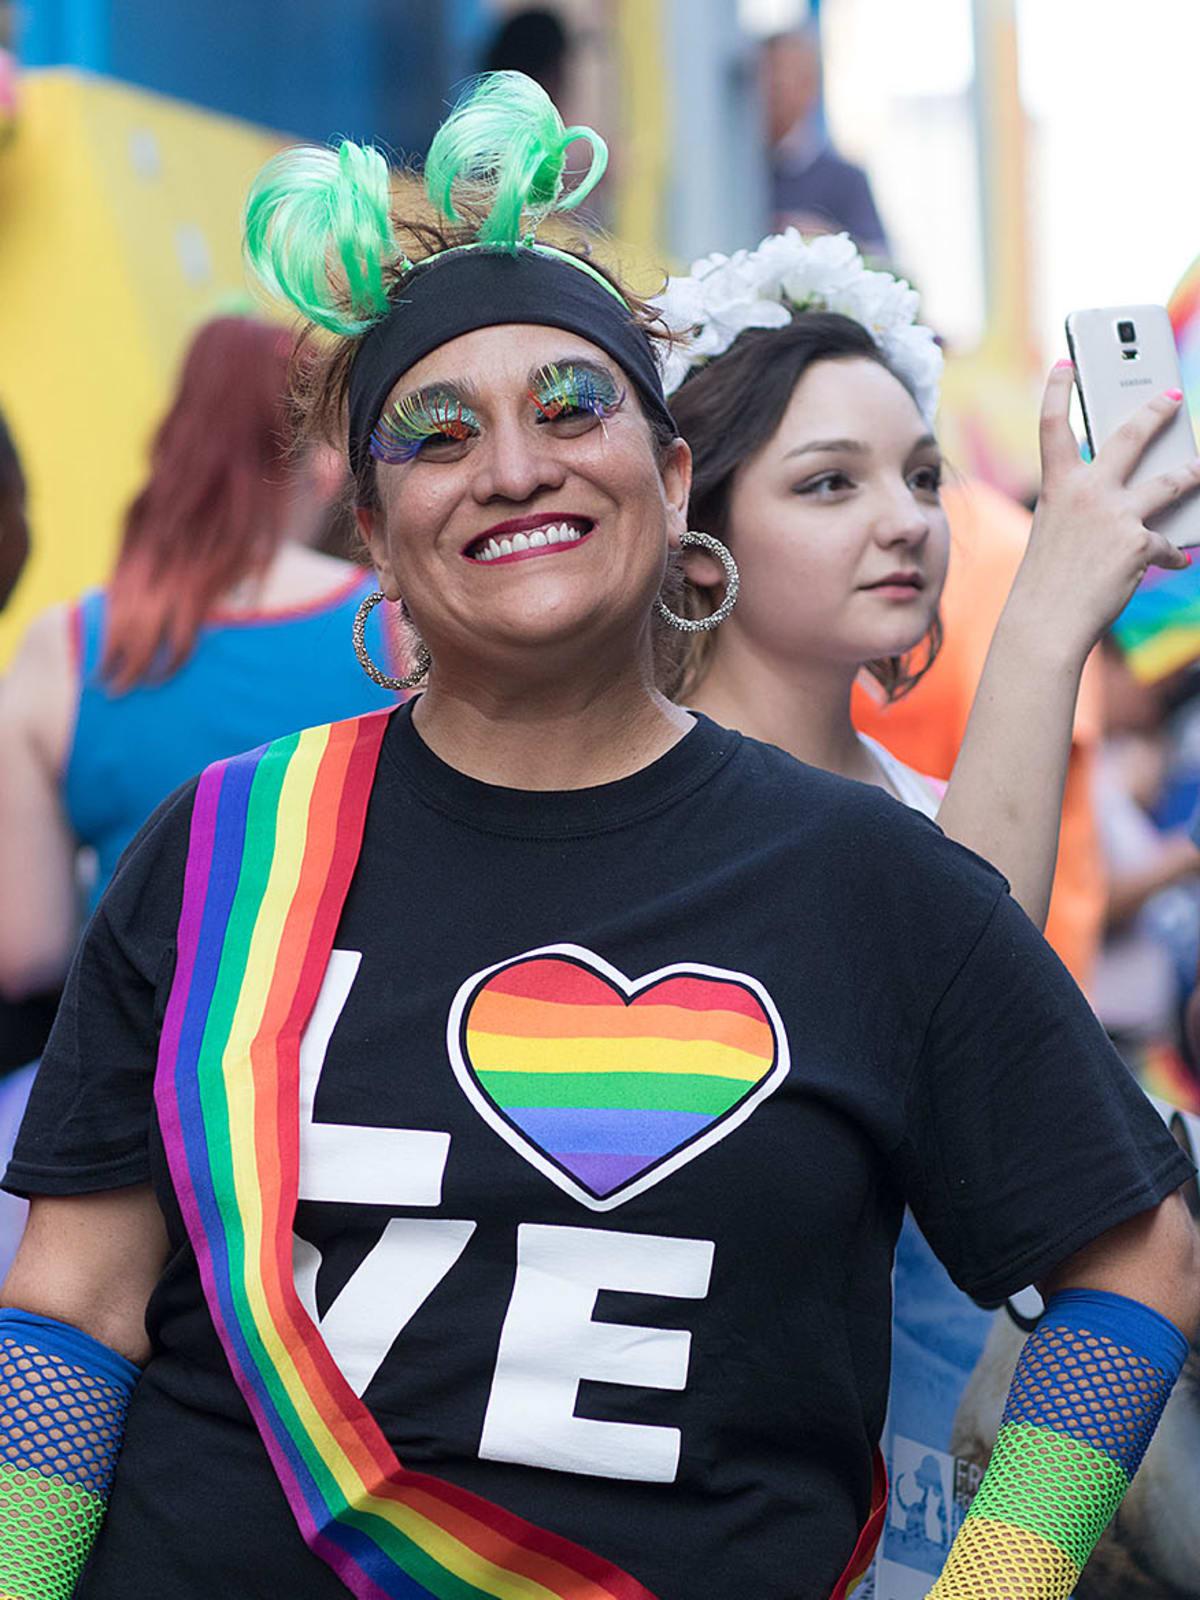 Houston Pride 2015 rainbow outfit